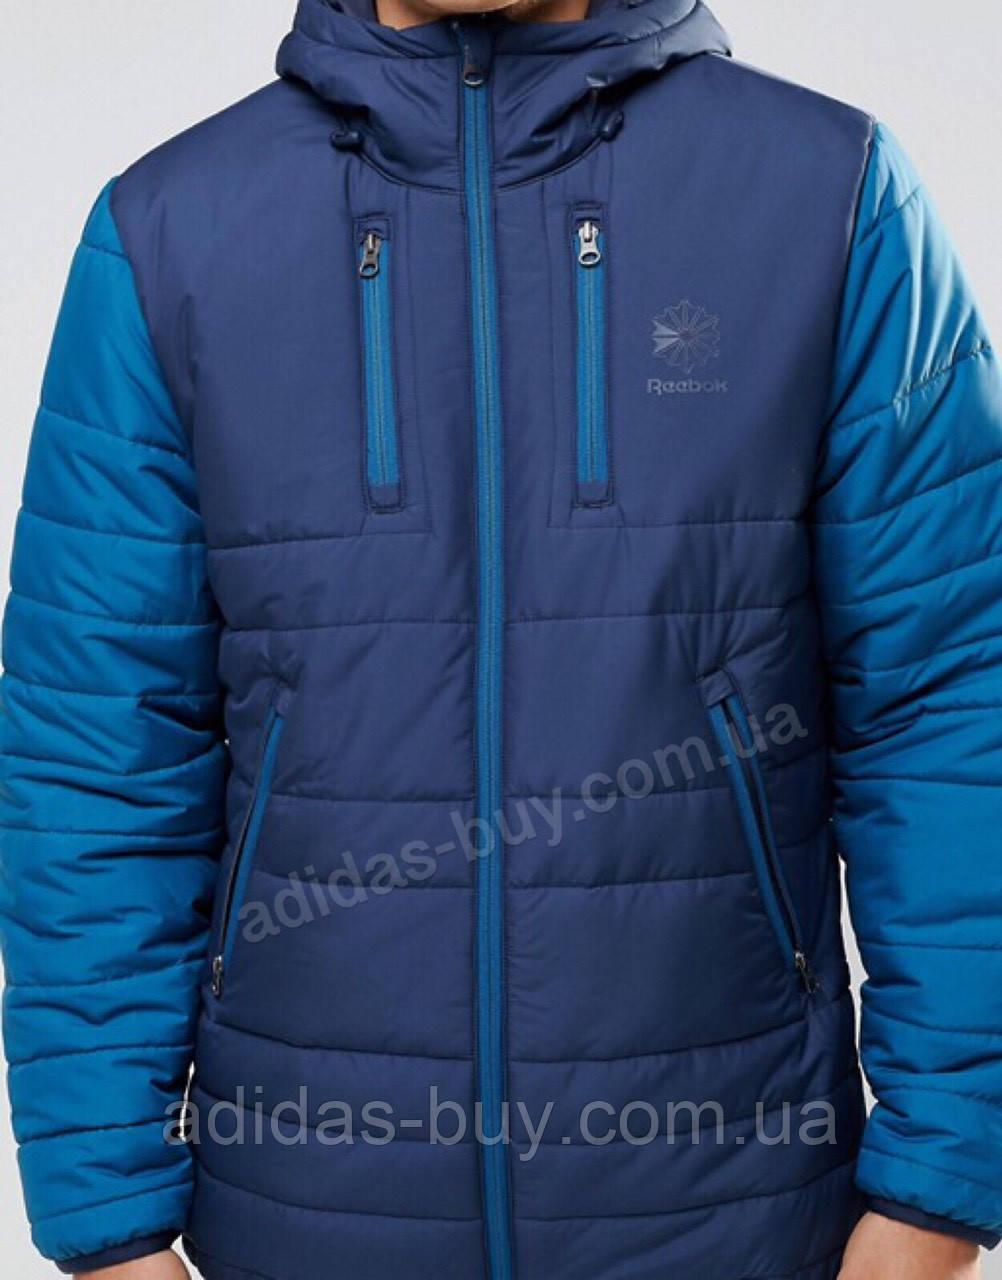 Куртка мужская оригинальная зимняя Reebok PADDED MID 2 JACKET AY1251 ц 76791f8000d9d